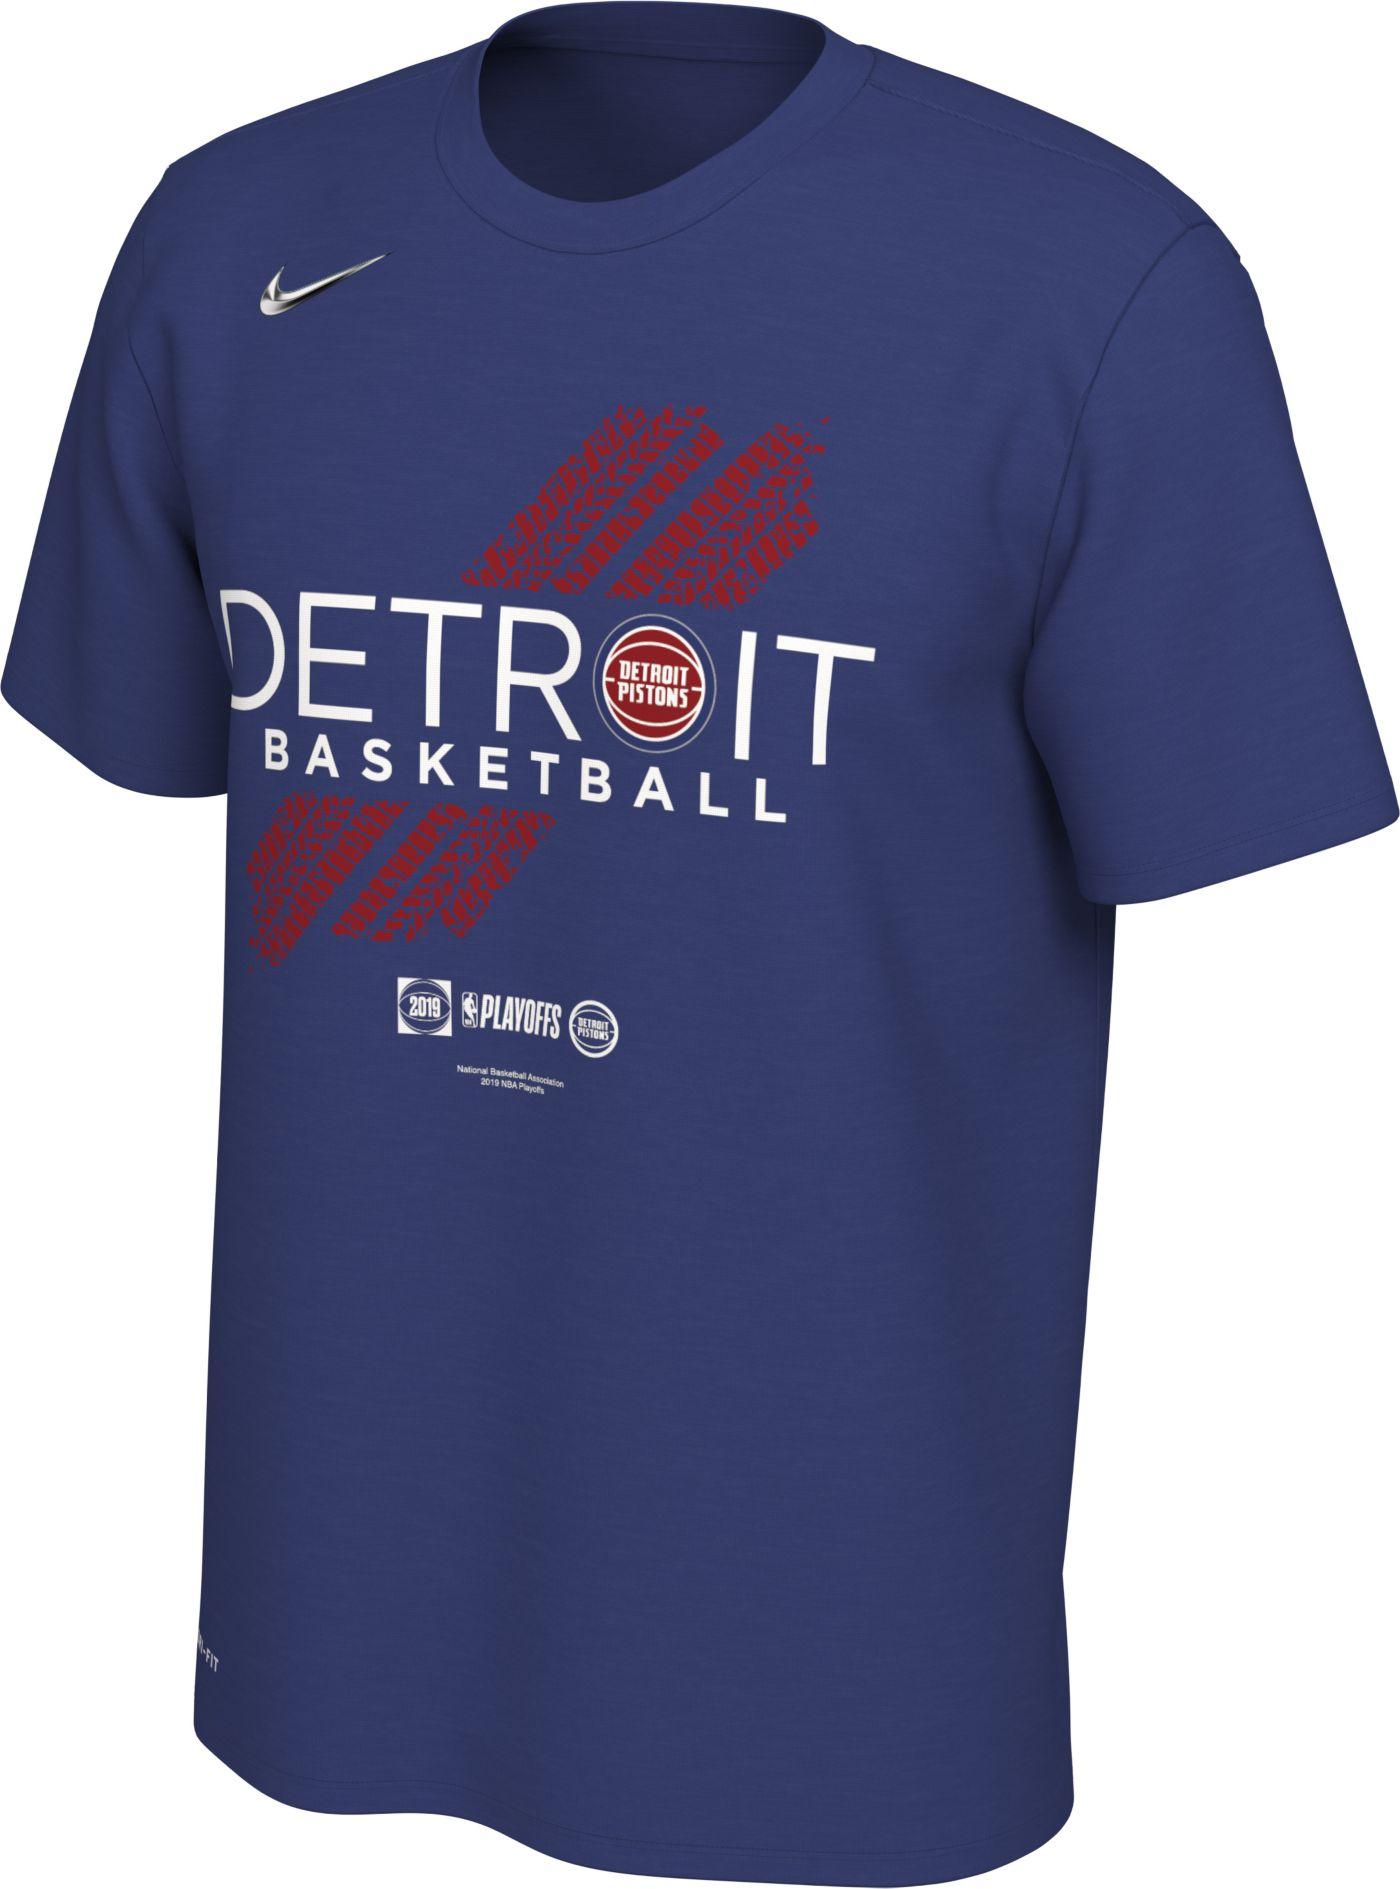 "Nike Youth Detroit Pistons 2019 Playoffs ""Detroit Basketball"" Dri-FIT T-Shirt"